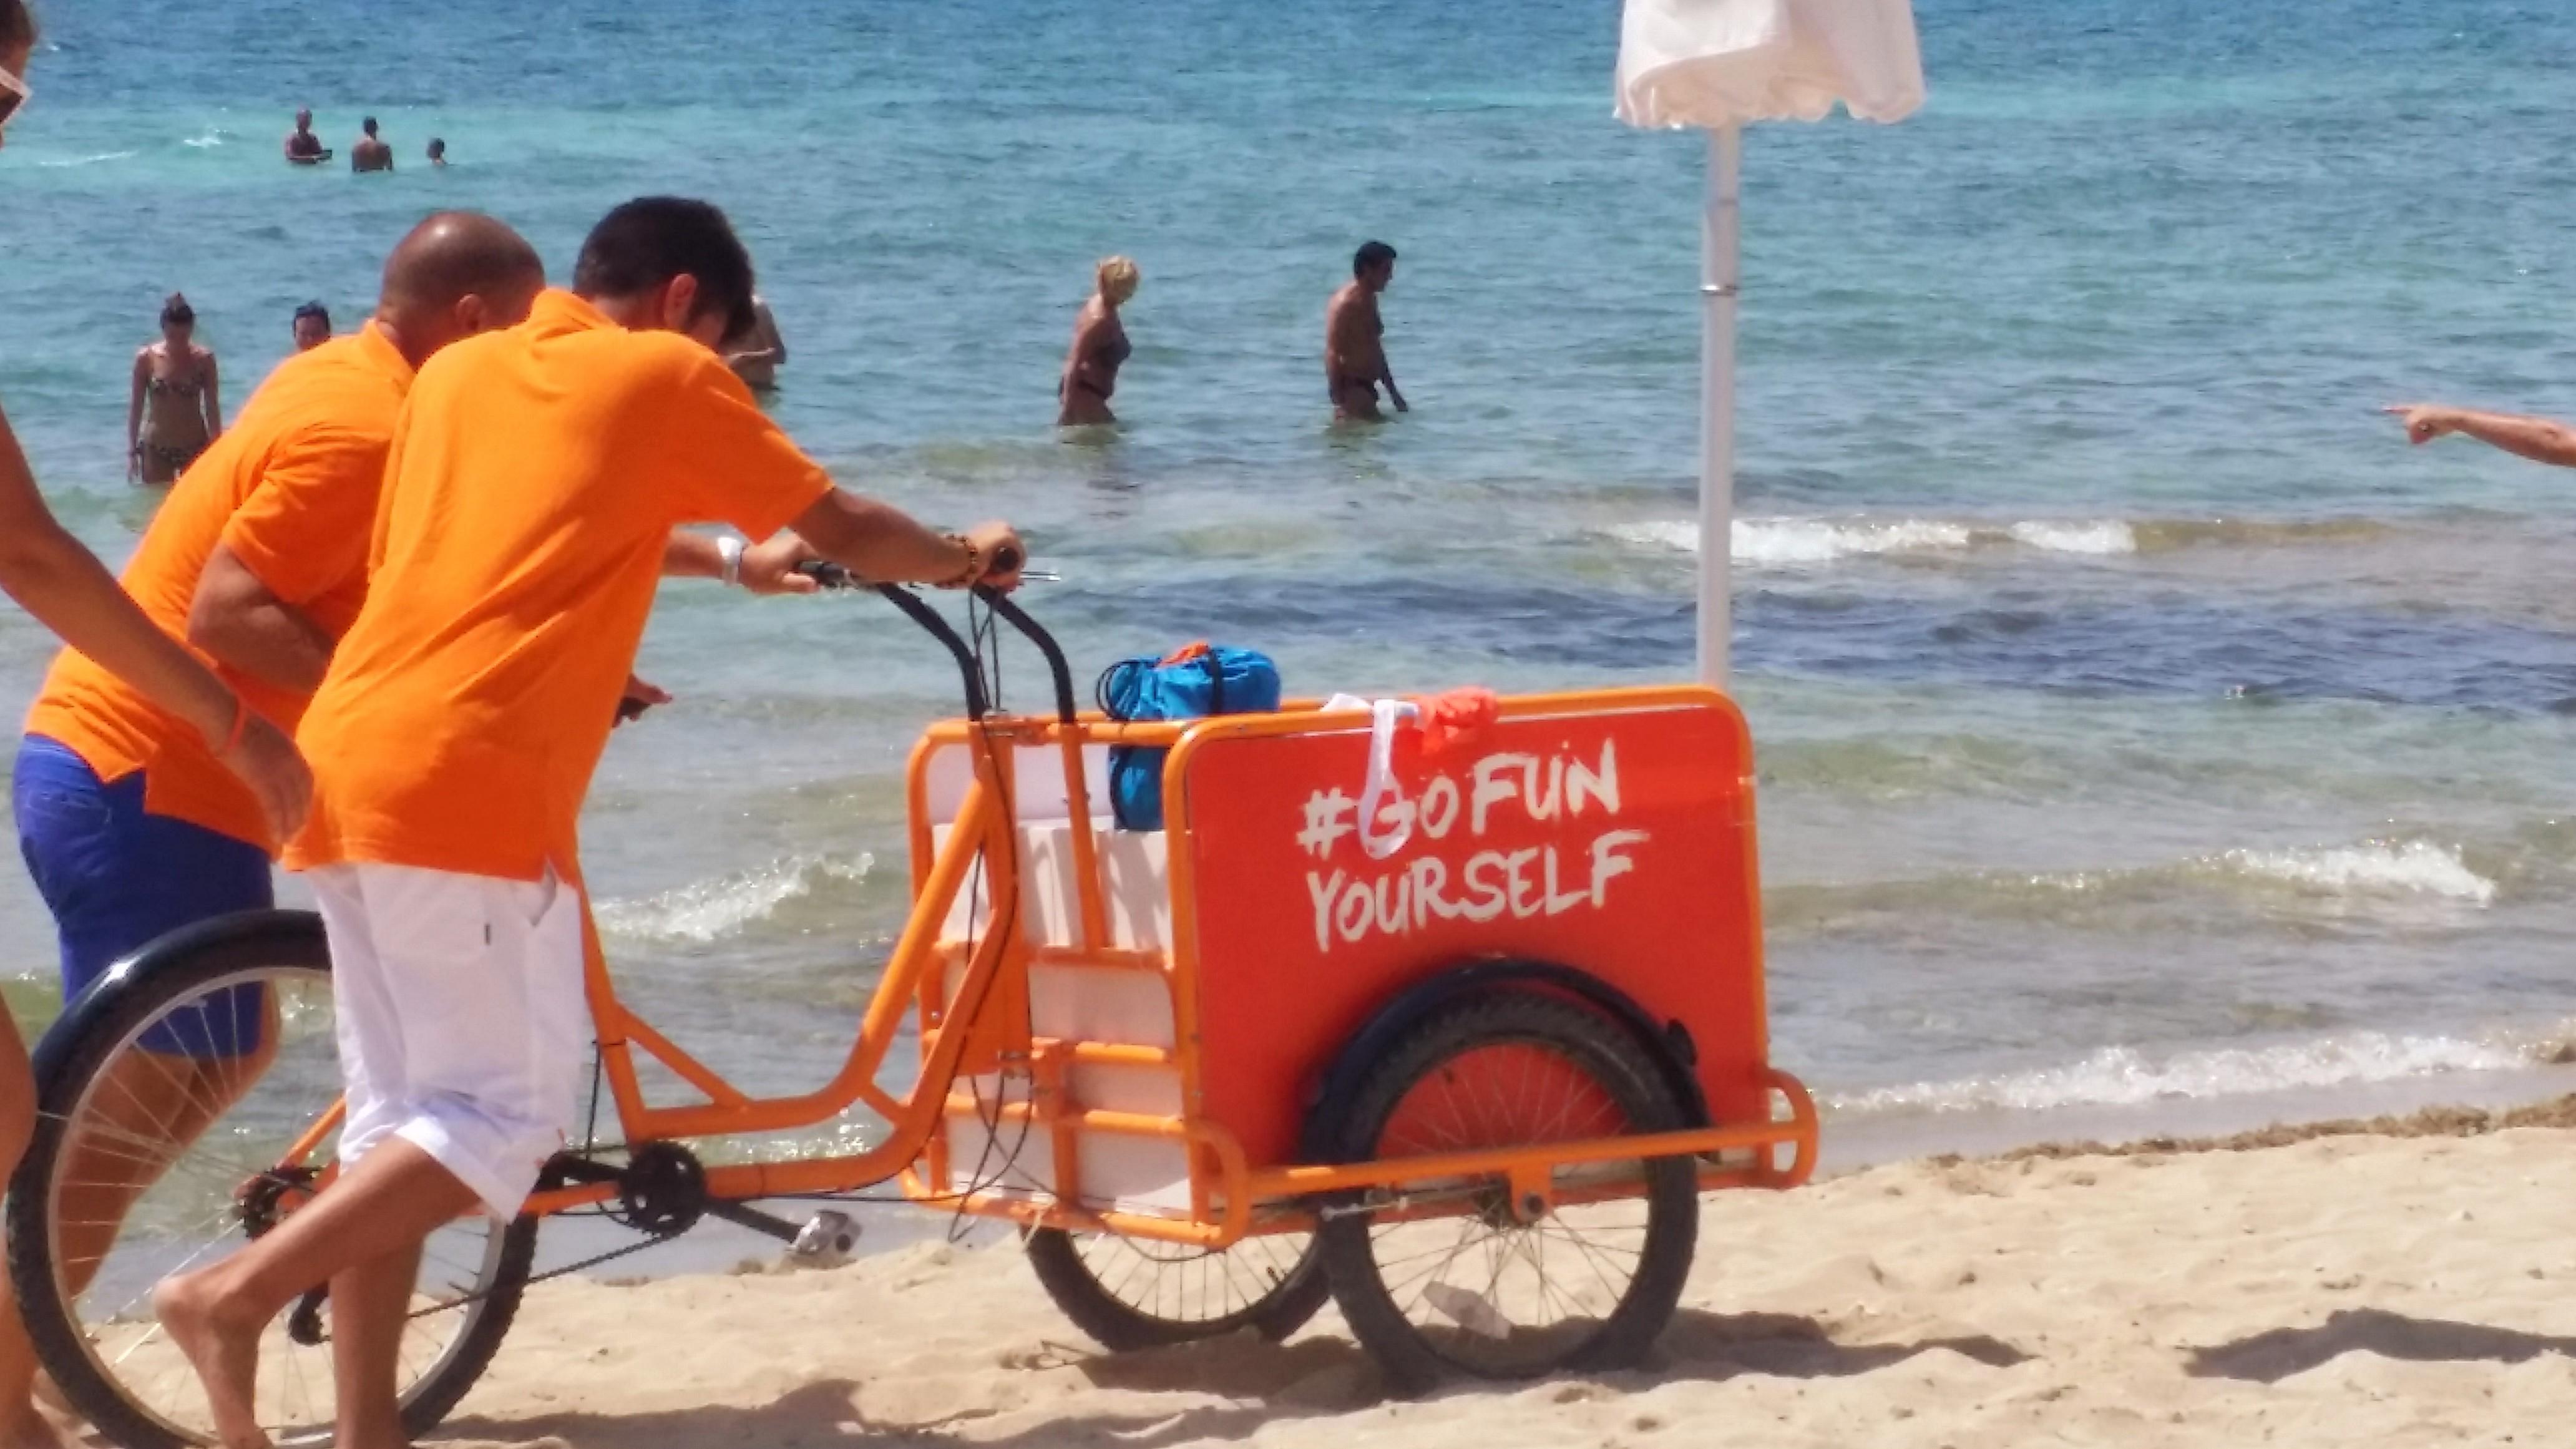 Aygo Fun Summer